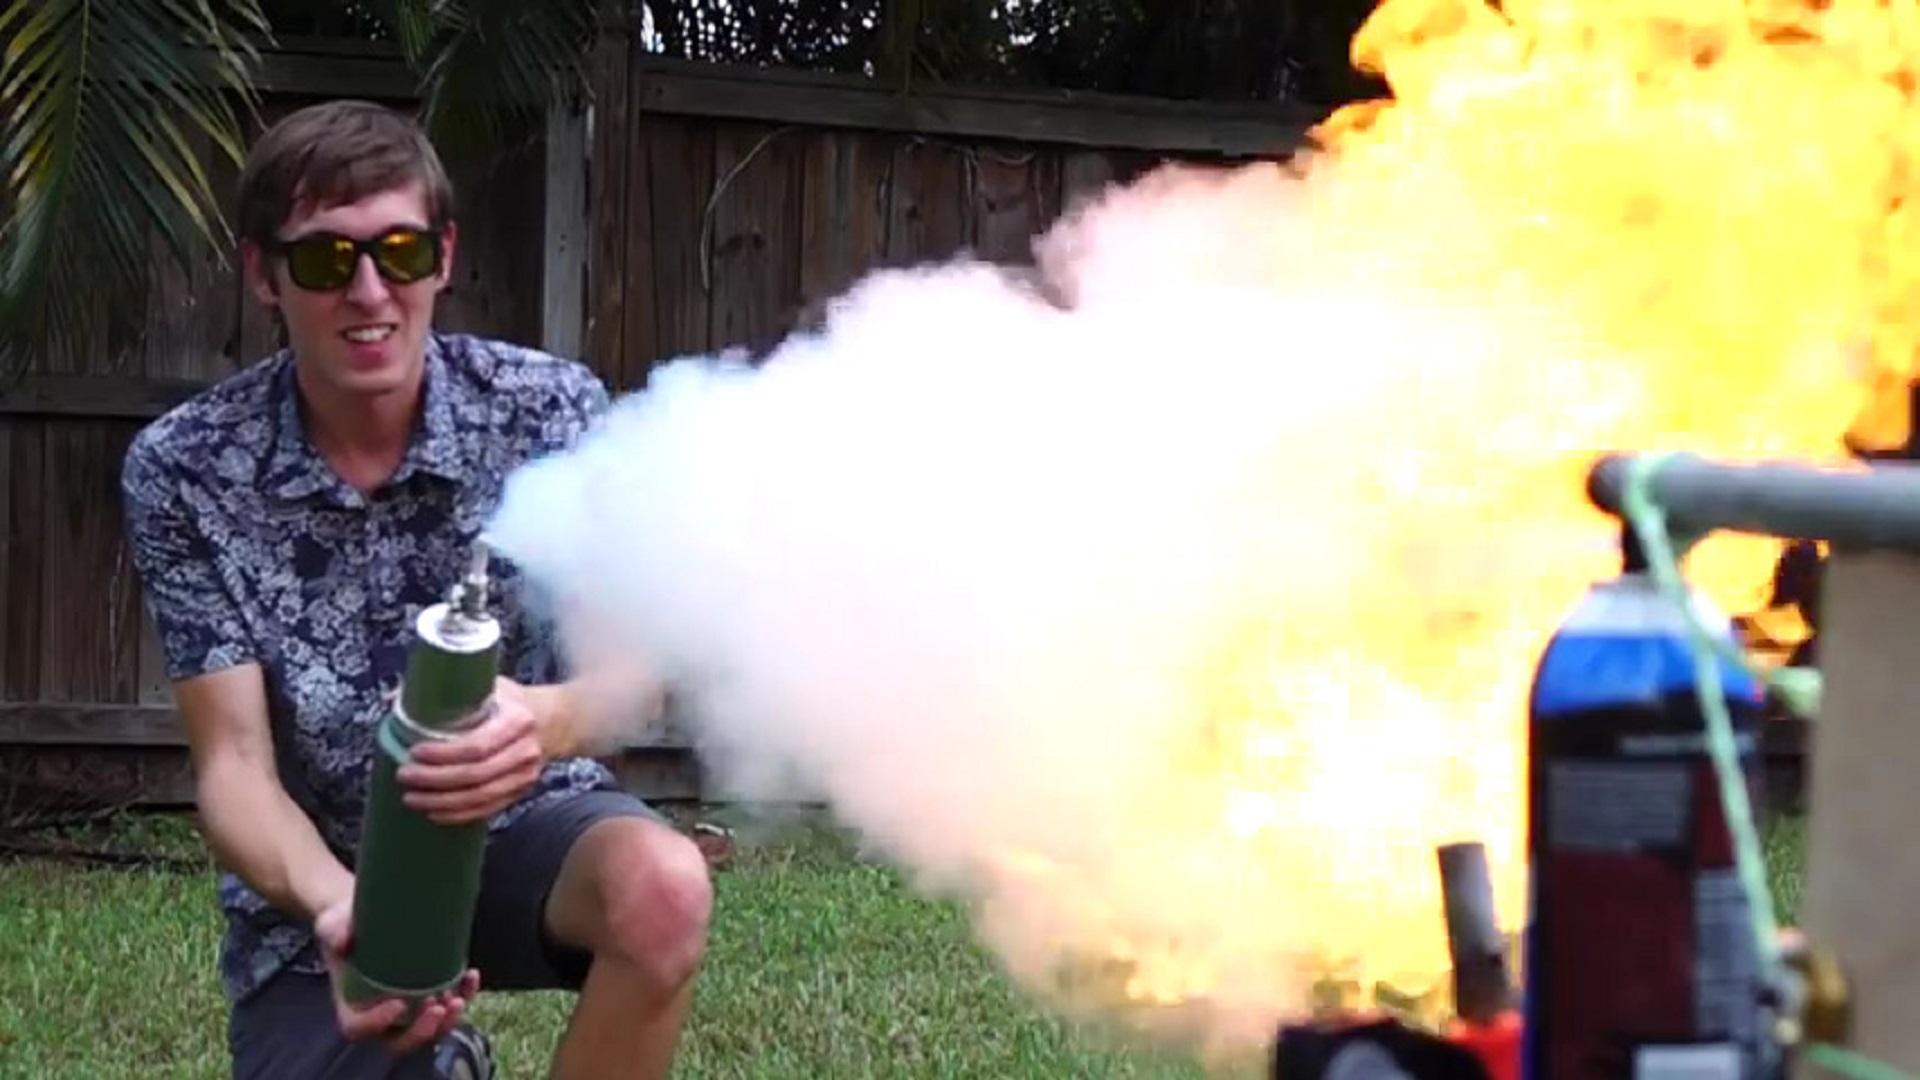 flamethrower-squirt-gun-denies-welch-huge-hairy-pussy-naked